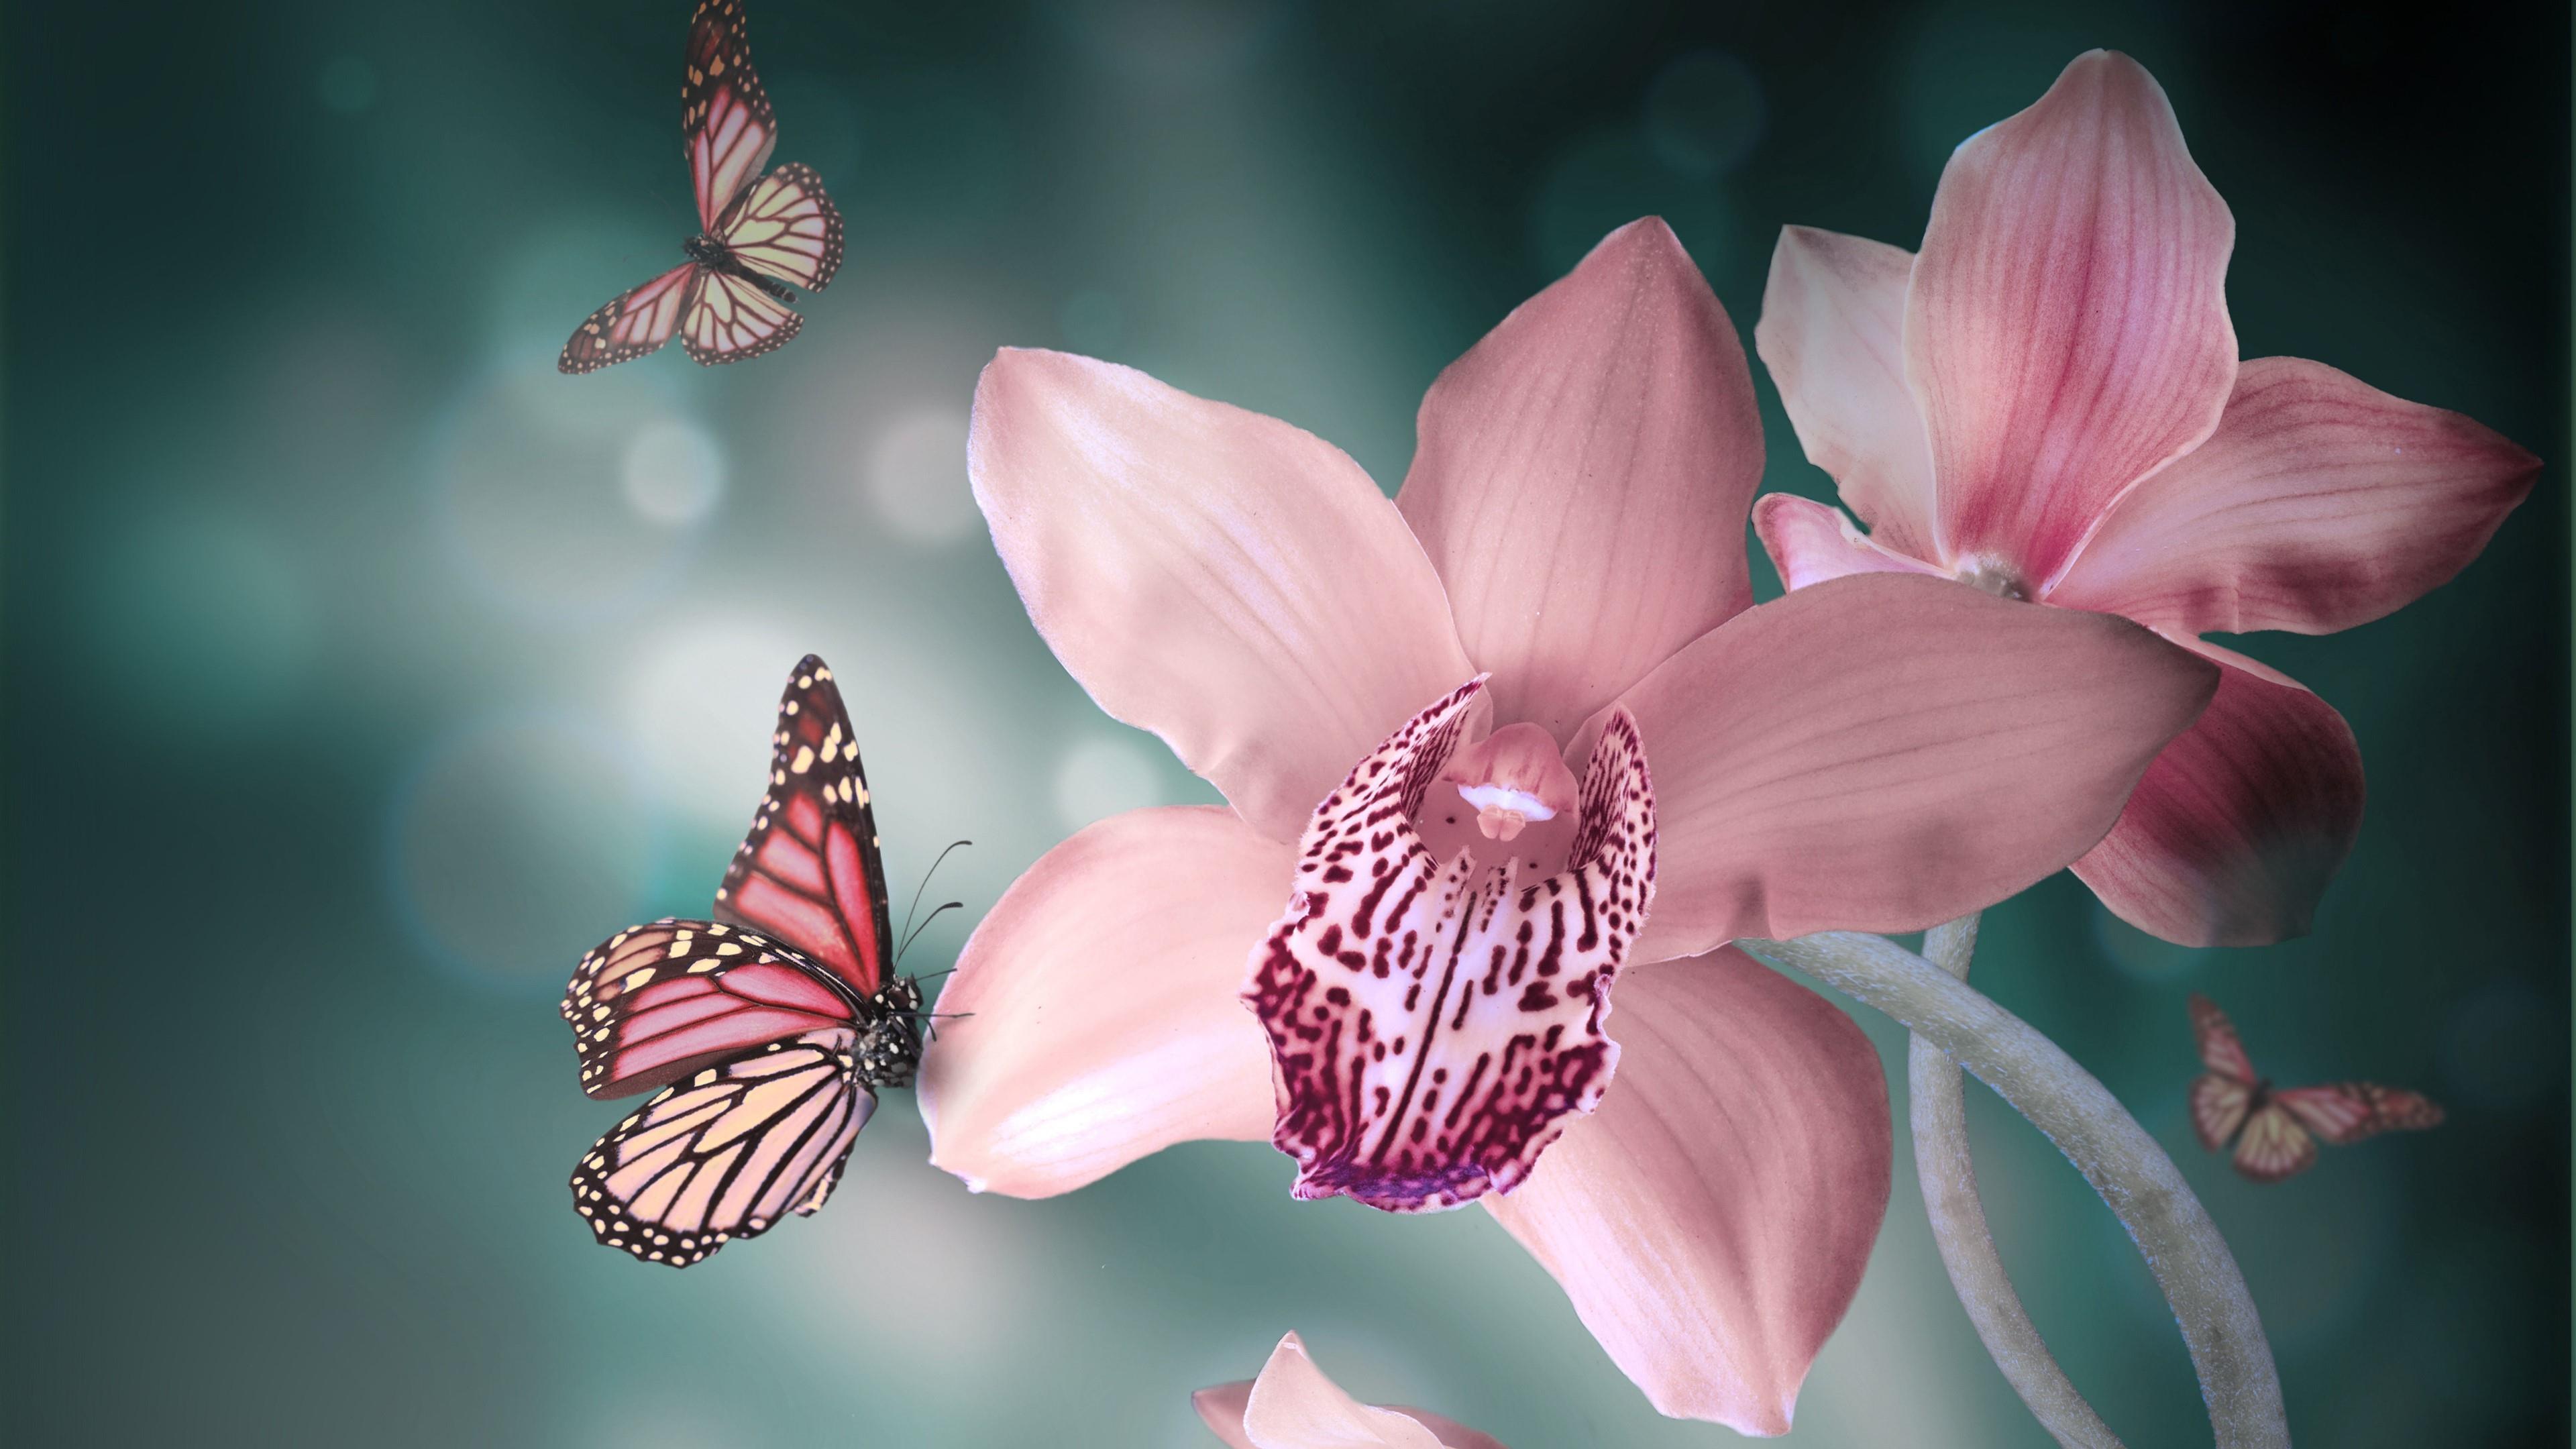 Pink orchids with butterflies wallpaper